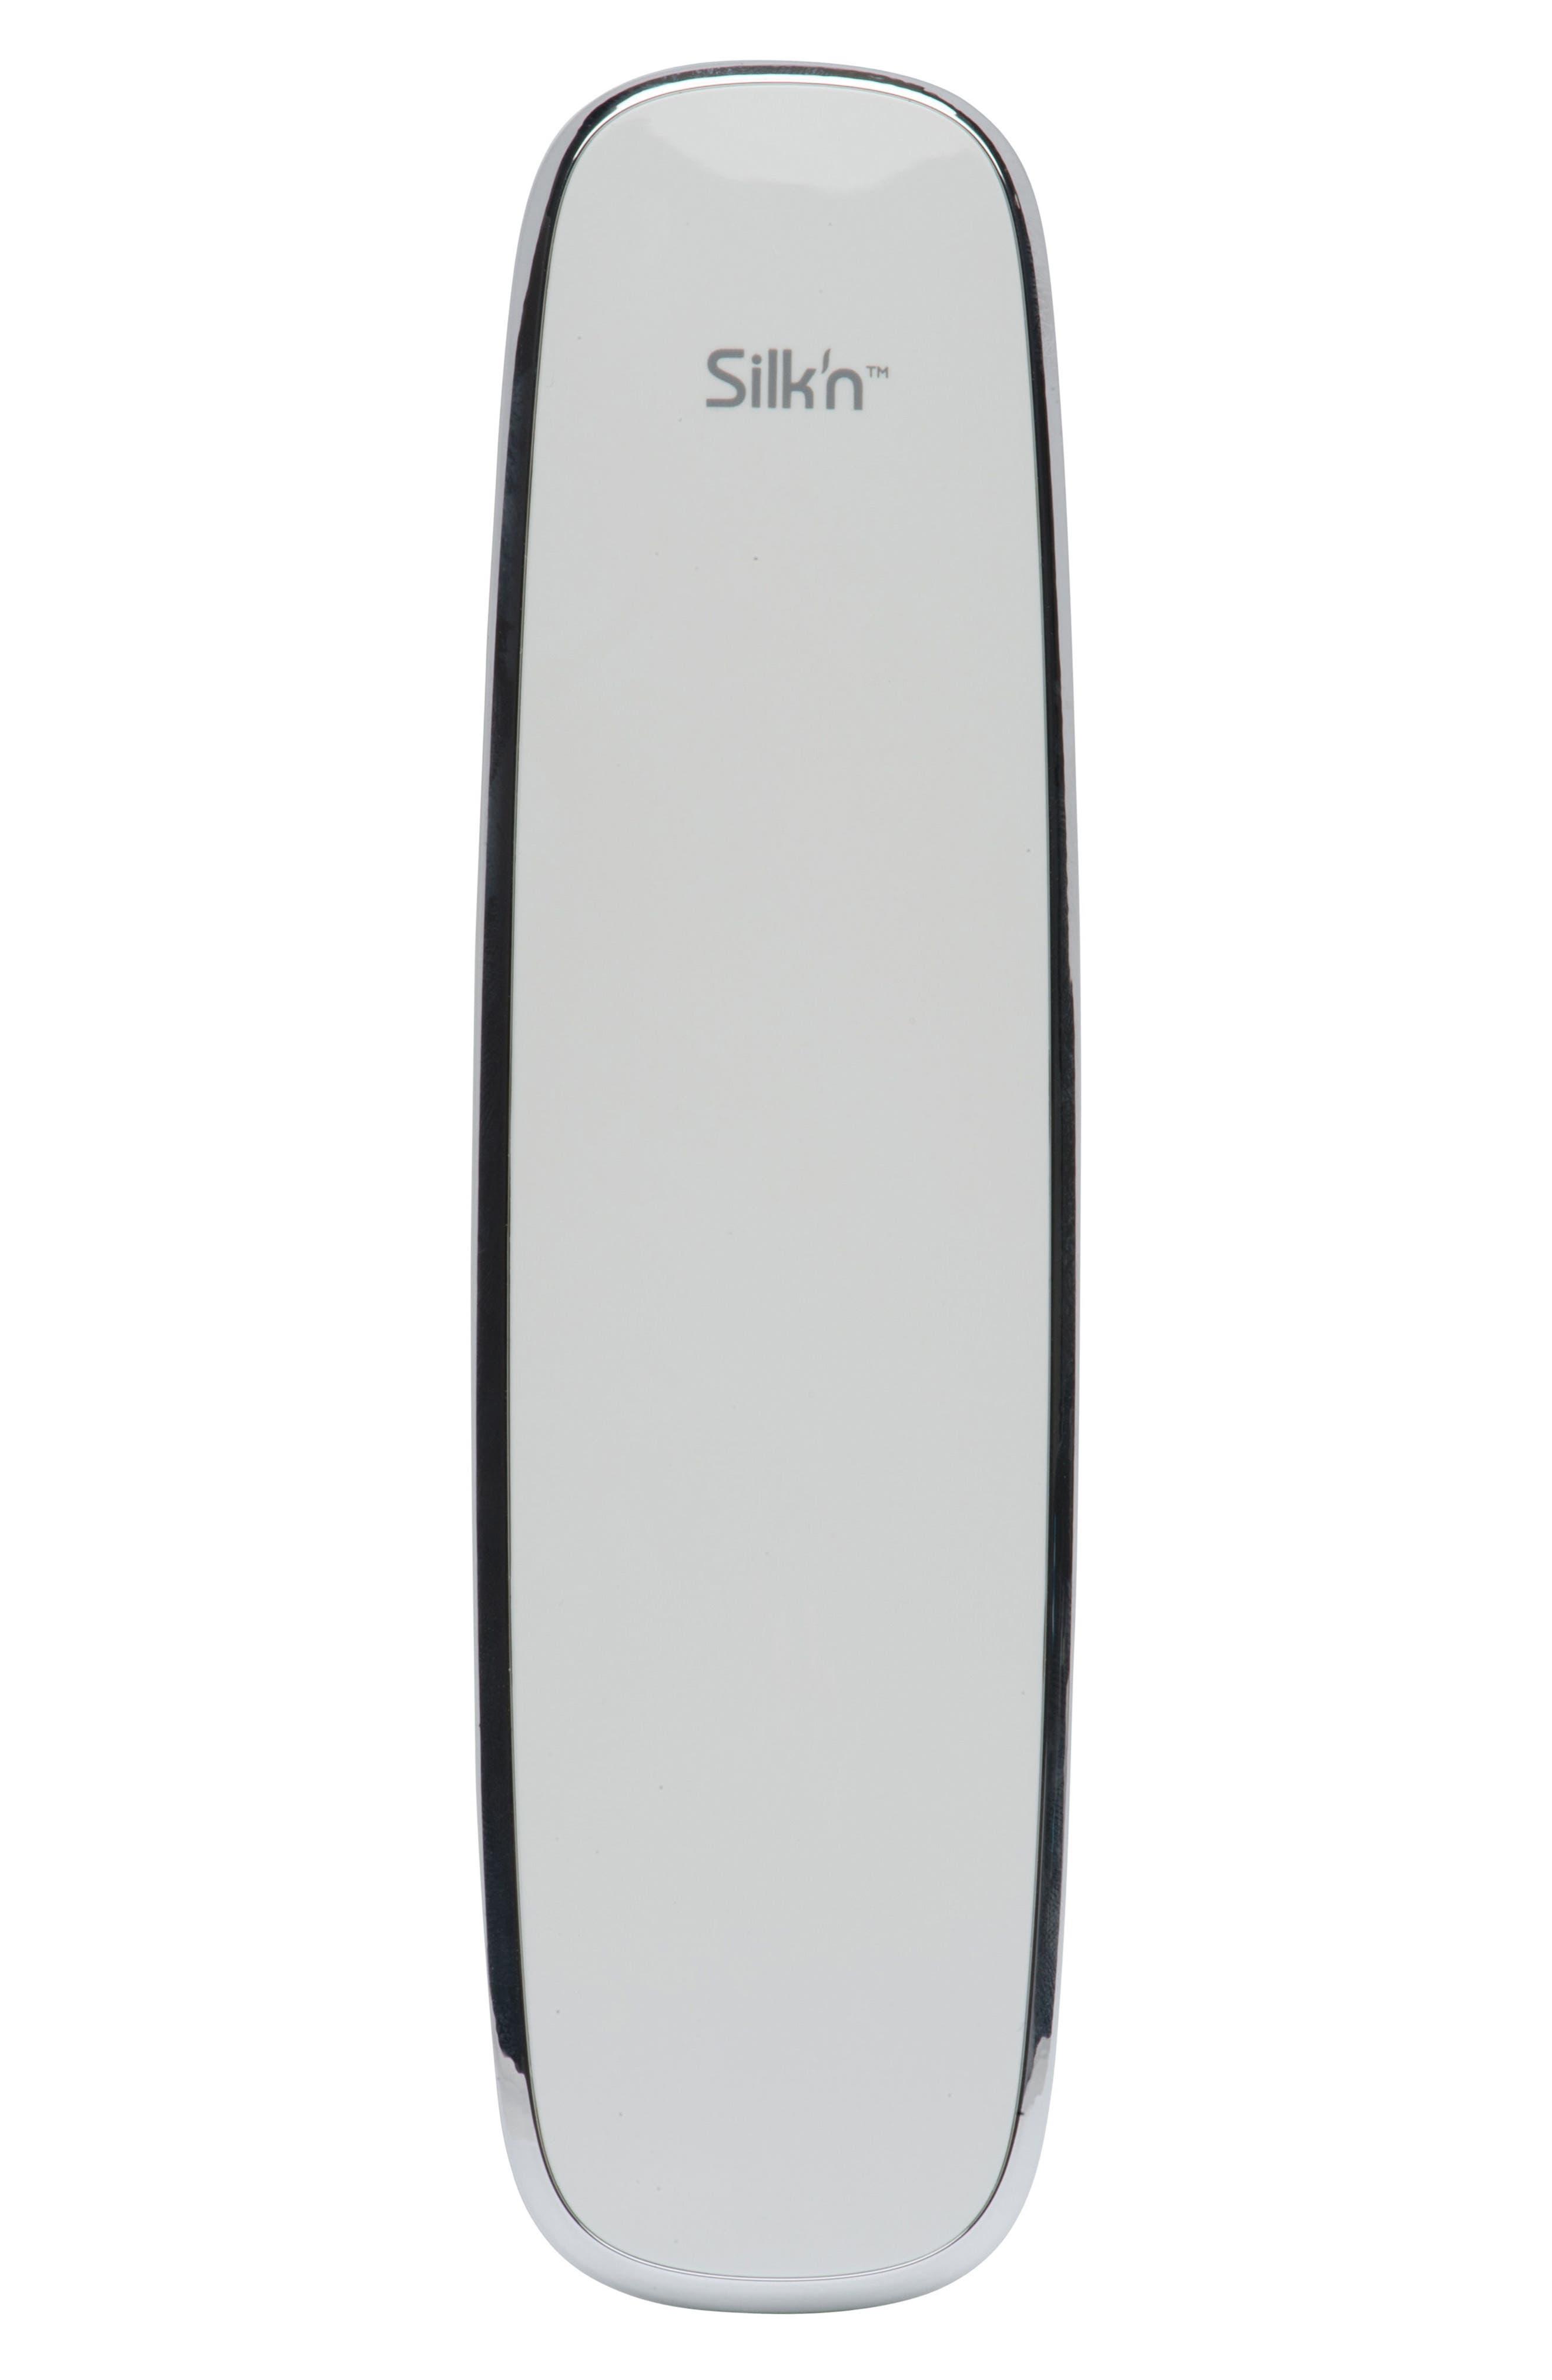 Titan Skin Tightening & Lifting Device,                             Main thumbnail 1, color,                             NO COLOR